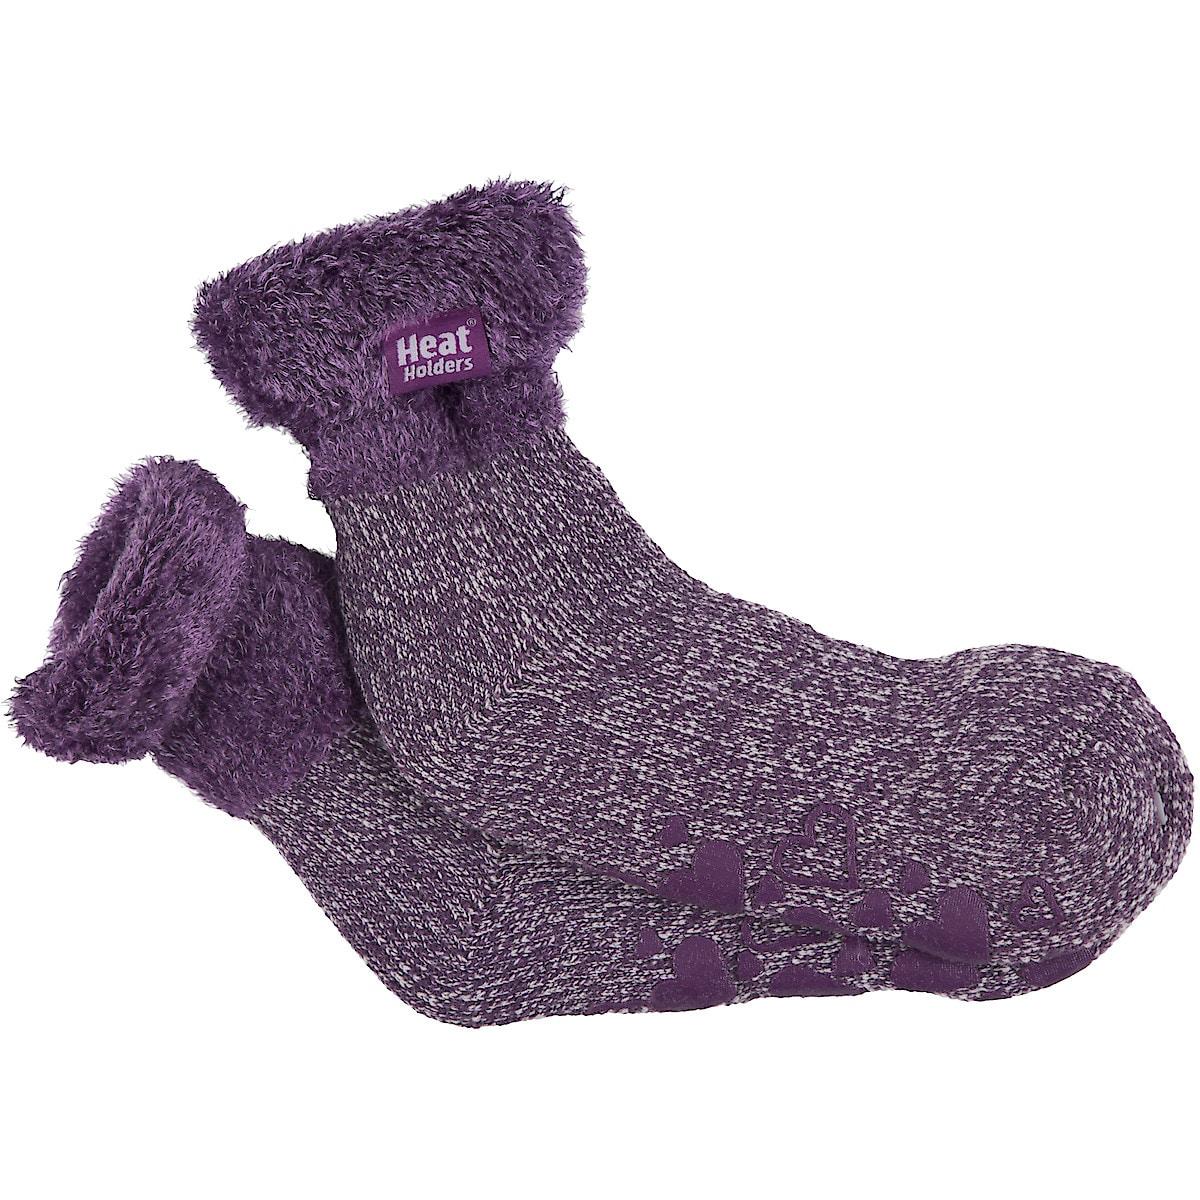 Heat Holders Lounge Thermal Socks